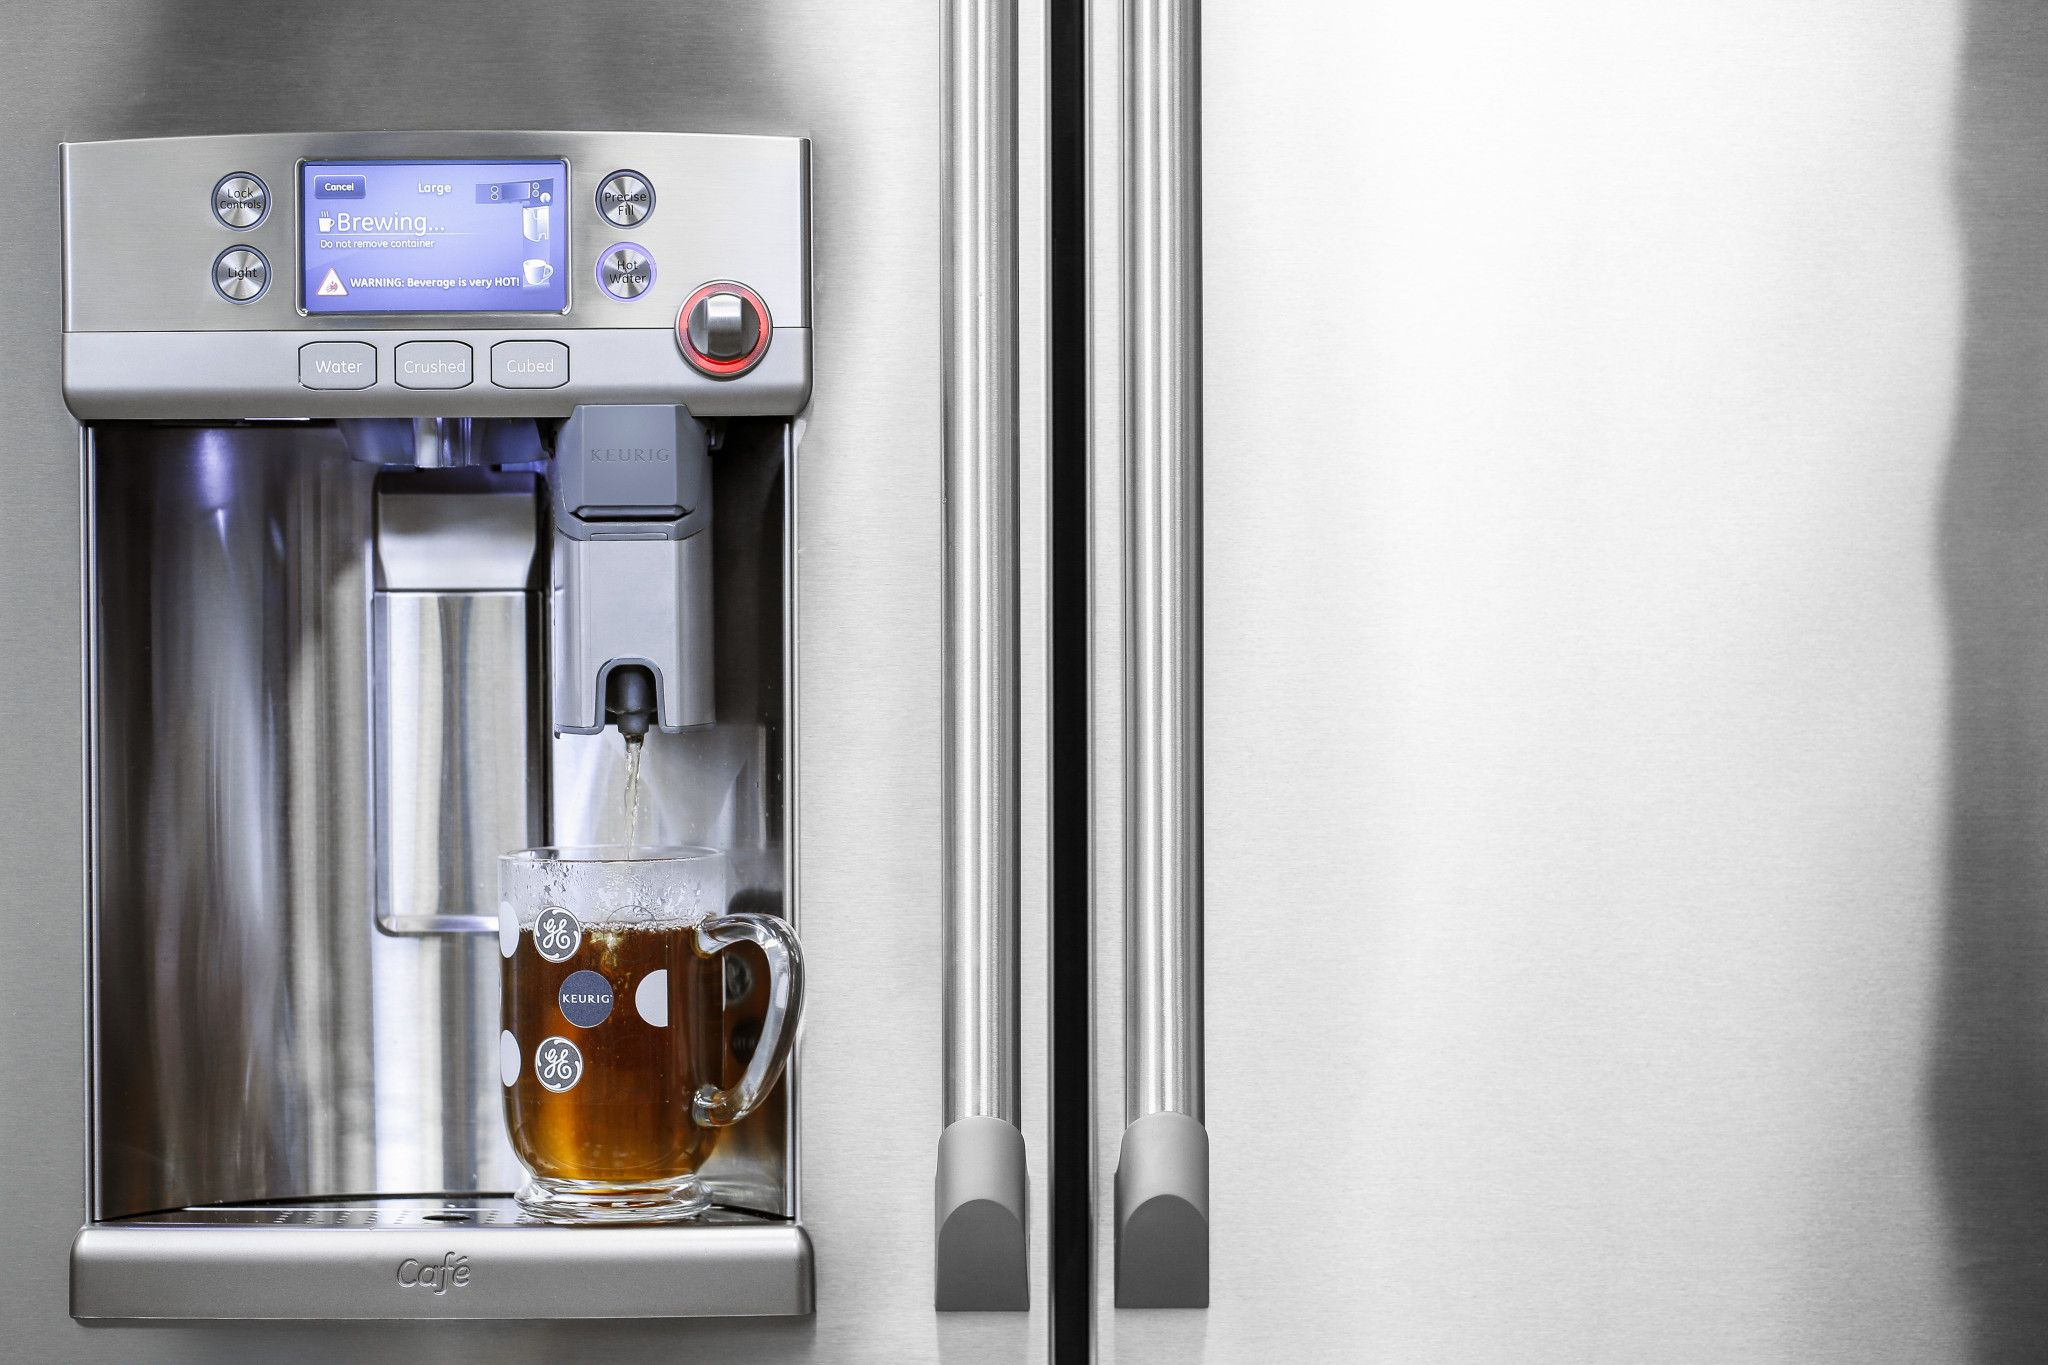 smart appliances Hi tech GE refrigerator wth keurig brewing